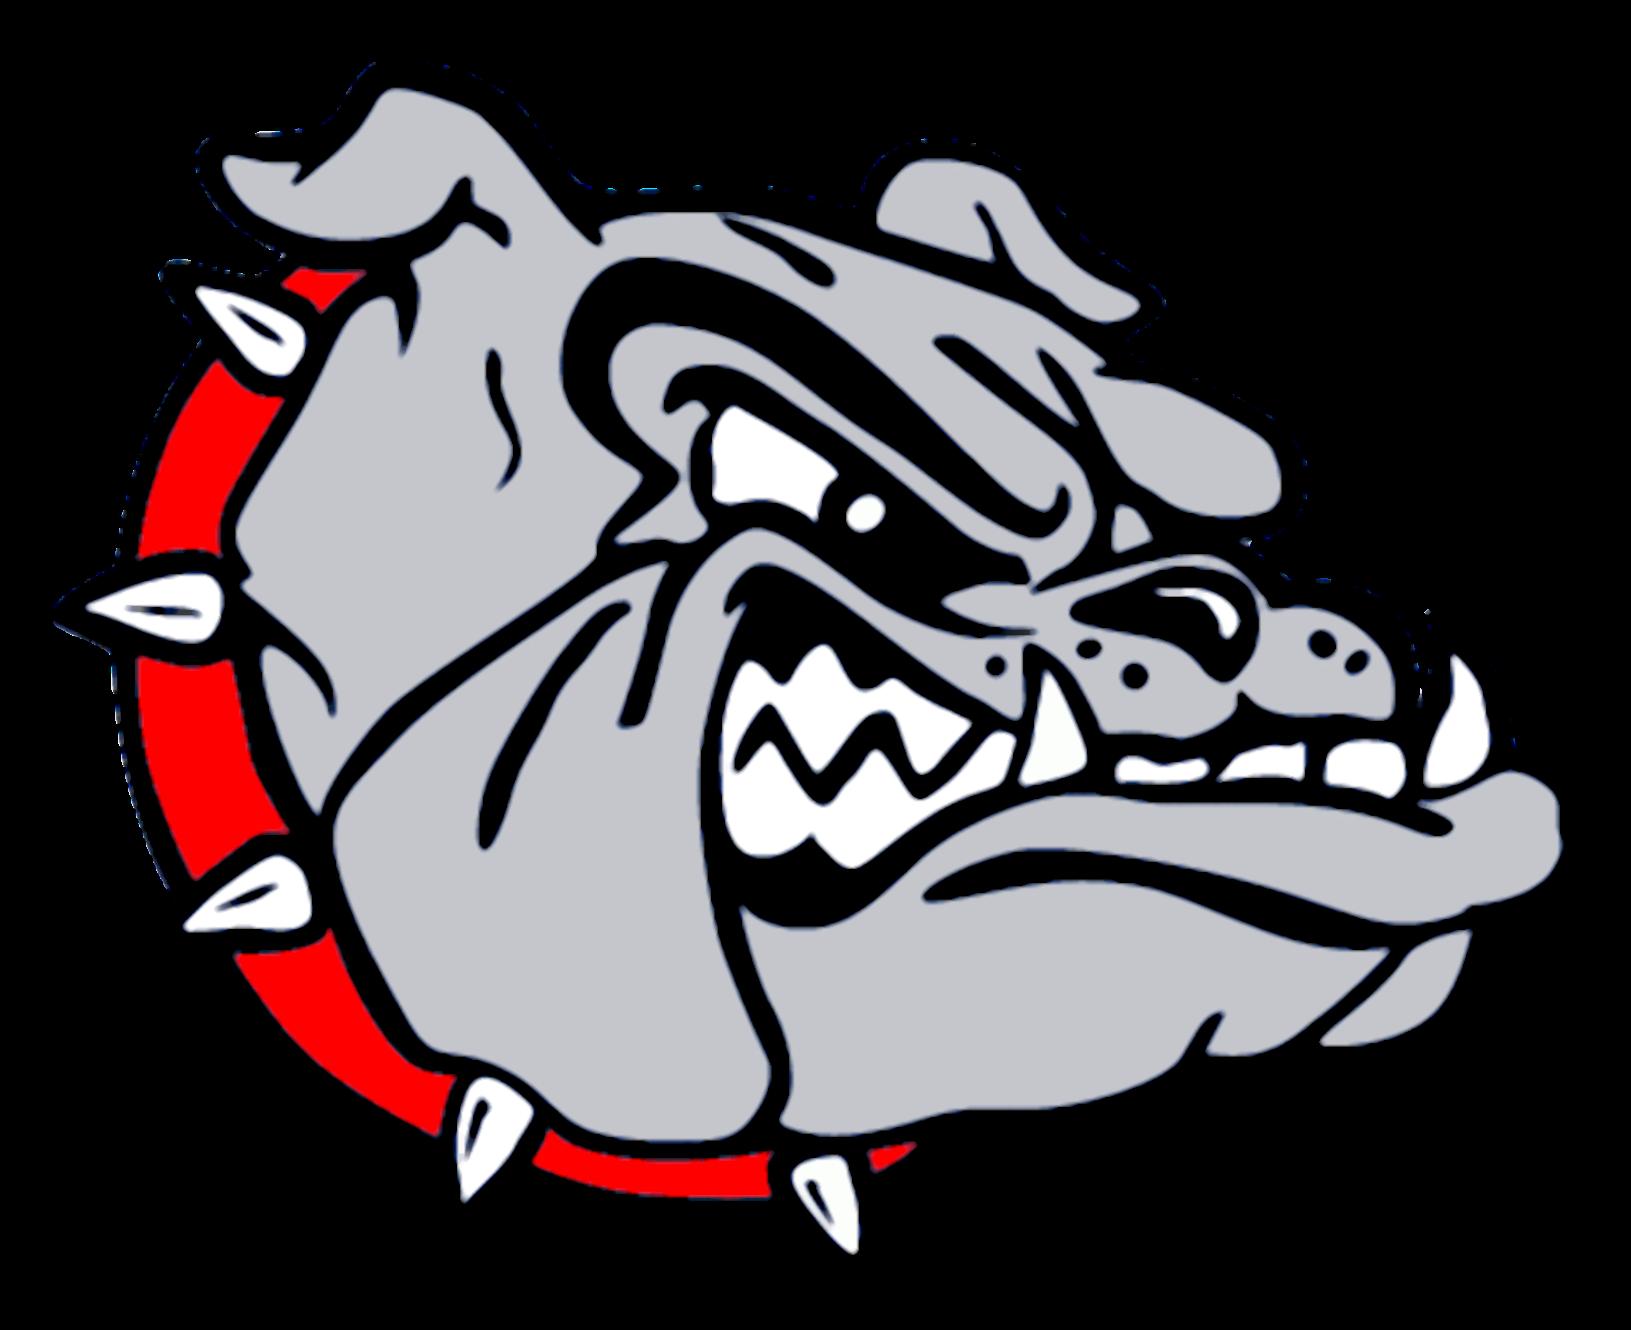 Bulldog clipart mascot graphic download Free Army Bulldog Cliparts, Download Free Clip Art, Free Clip Art on ... graphic download